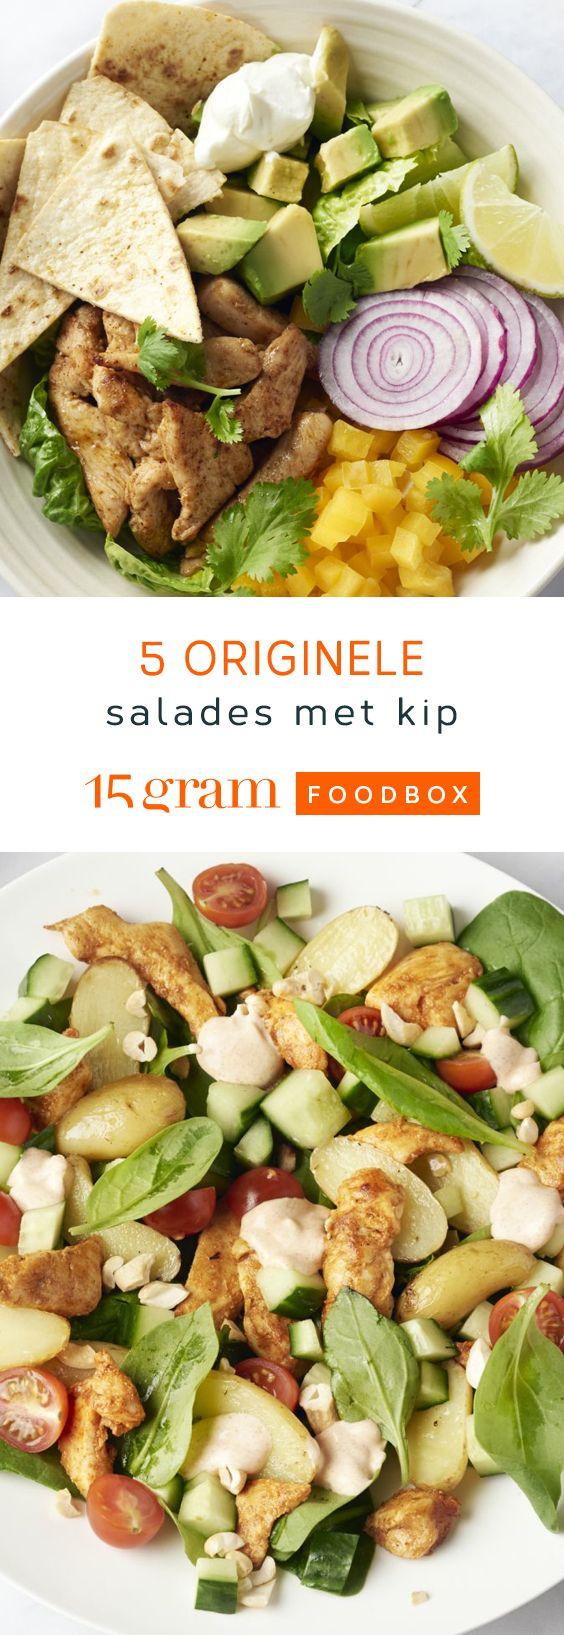 12 salades parfaites pour accompagner un barbecue | Salade